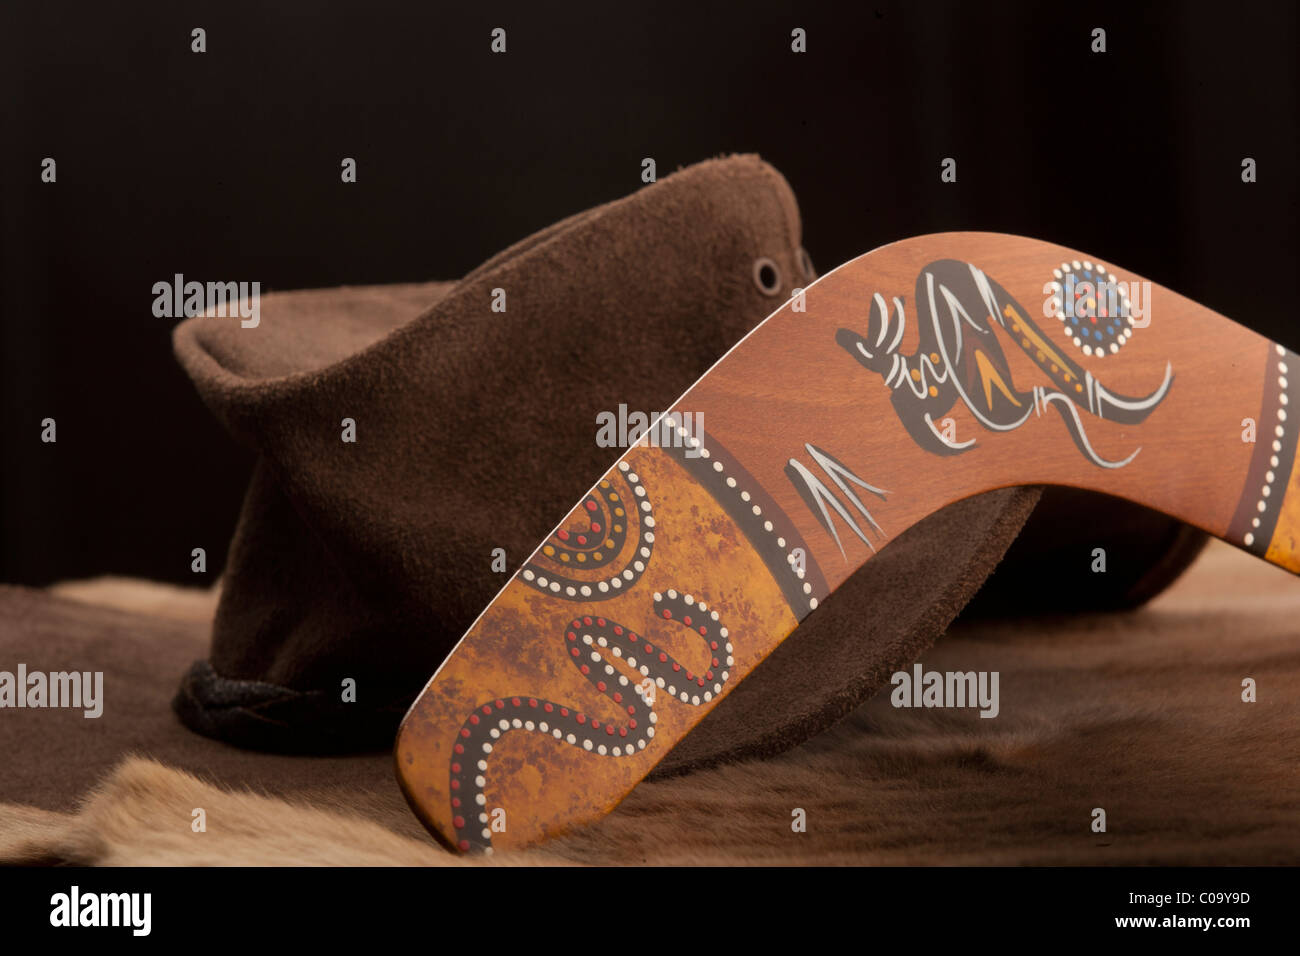 Australian Bush hat, di Episteme lo stile e il boomerang sulla kangaroo-pelle PELT. Immagini Stock